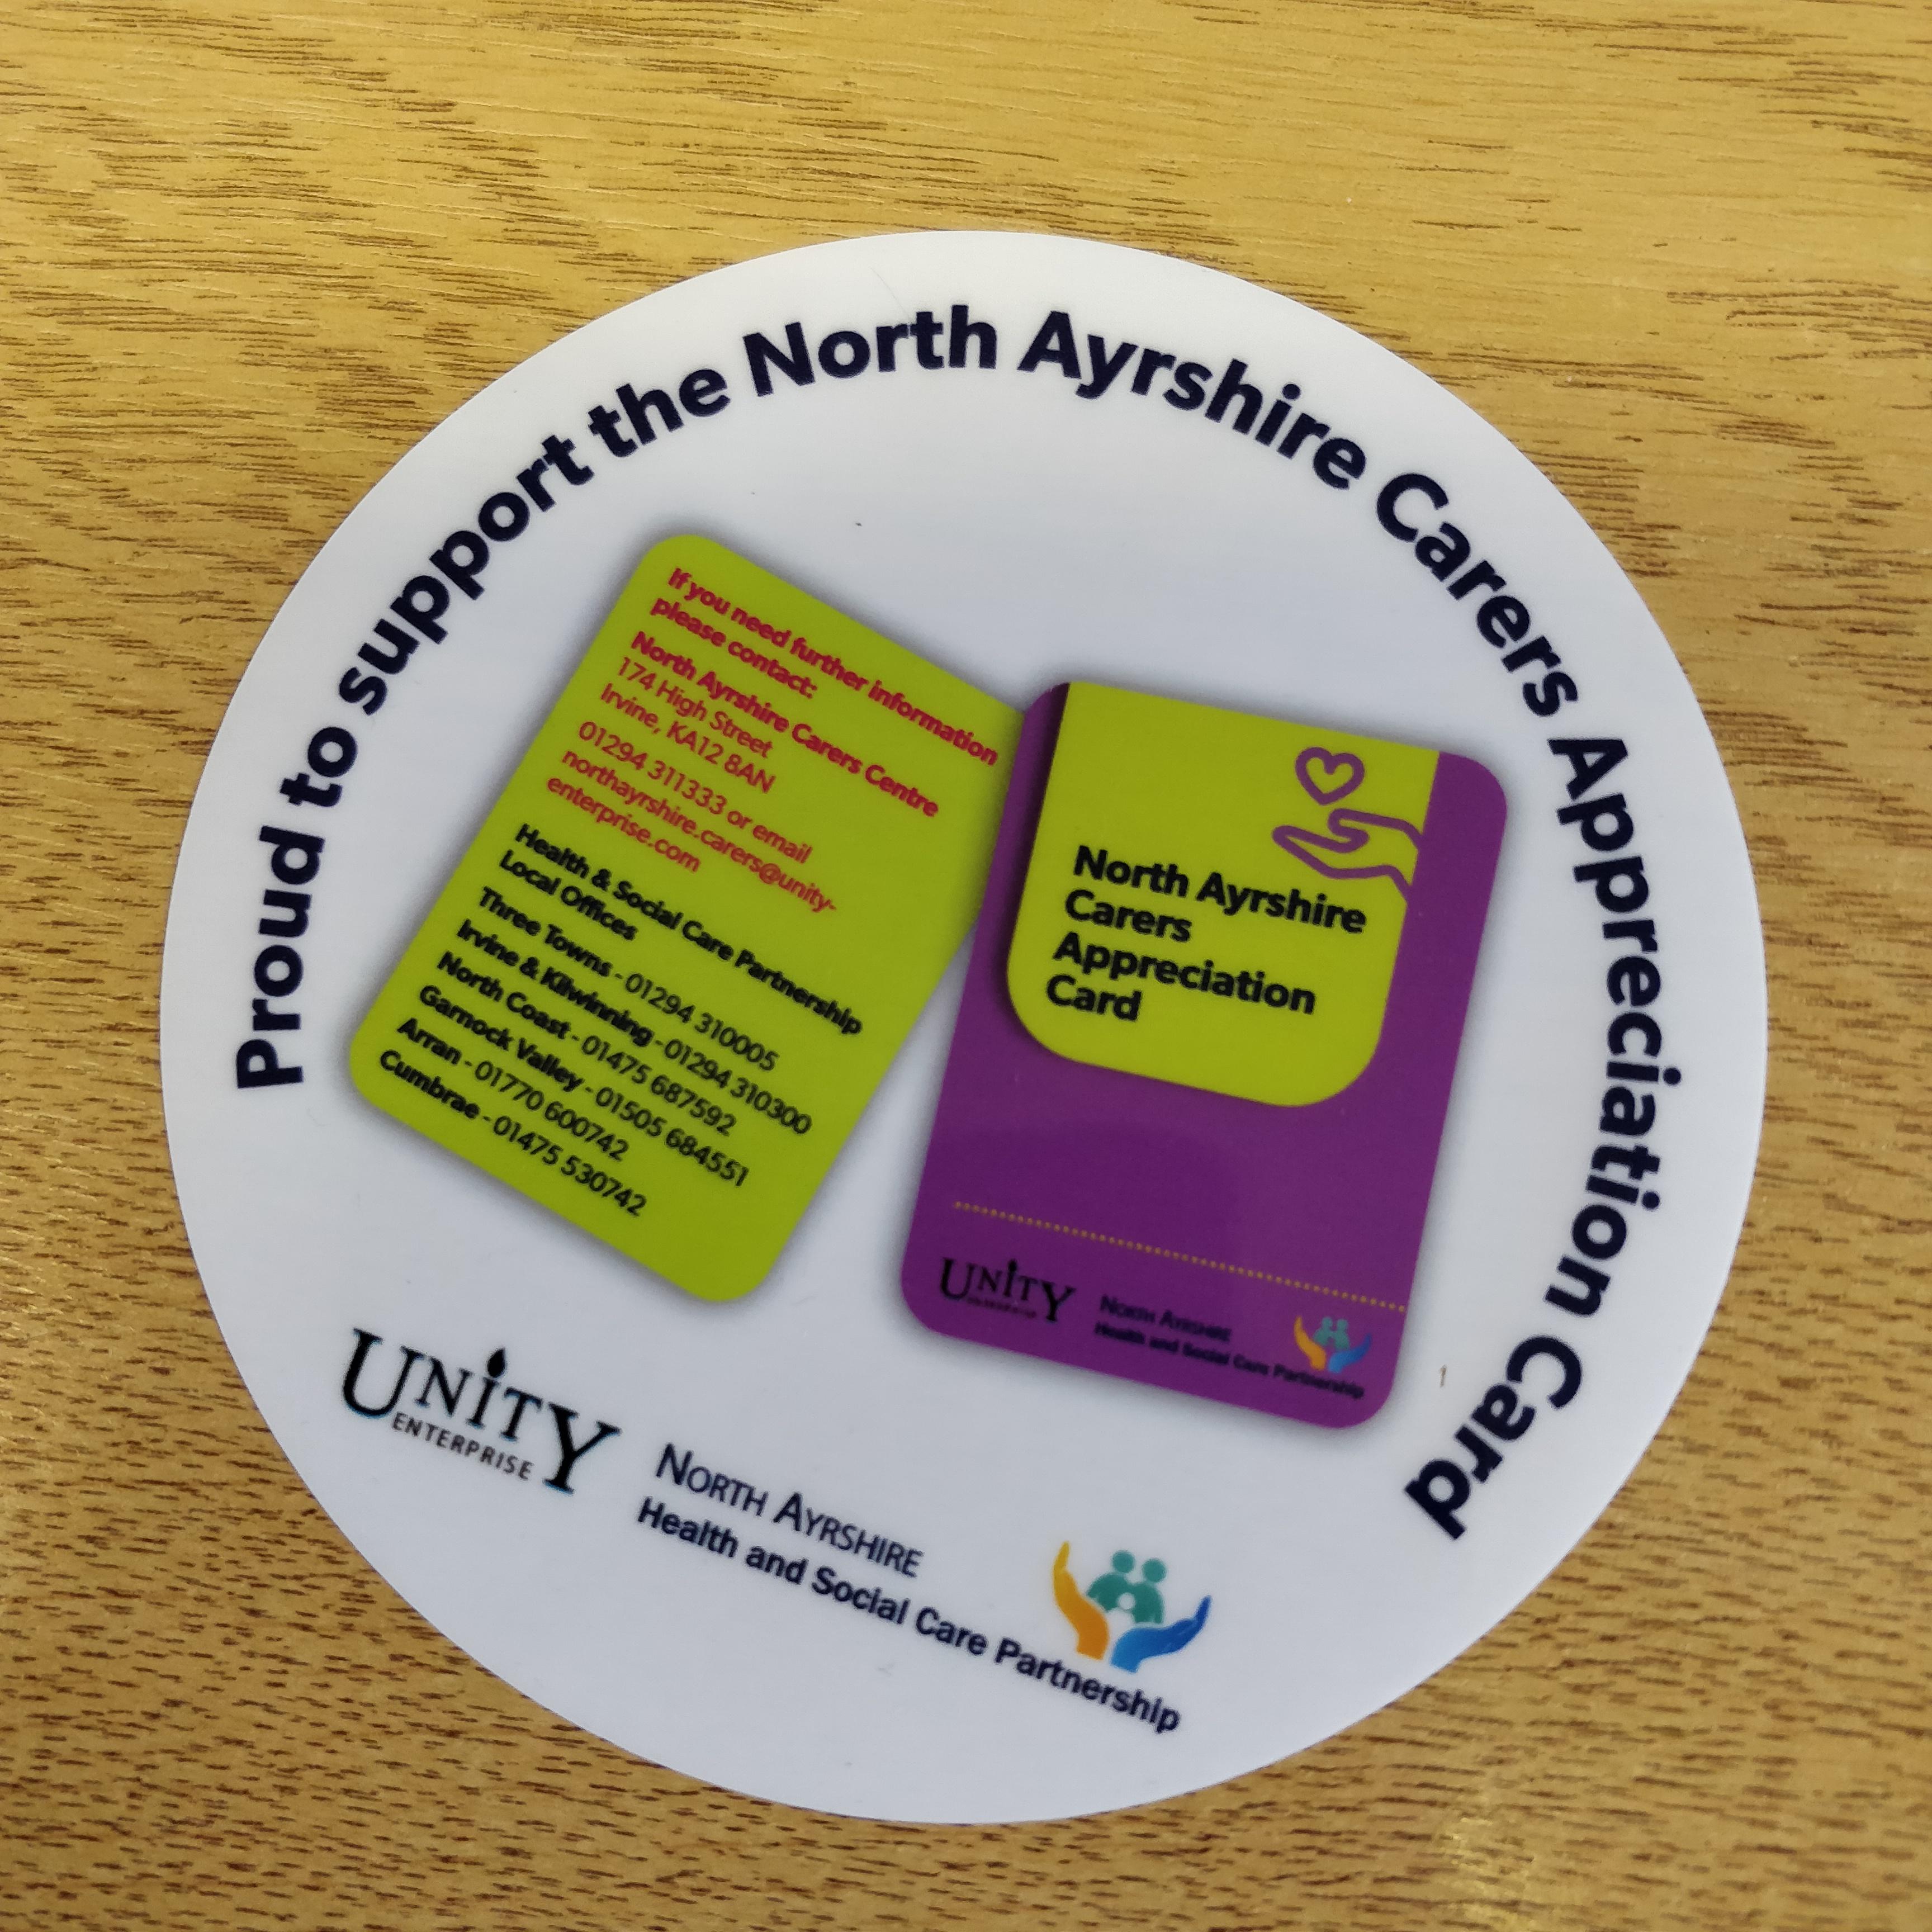 North Ayrshire carers